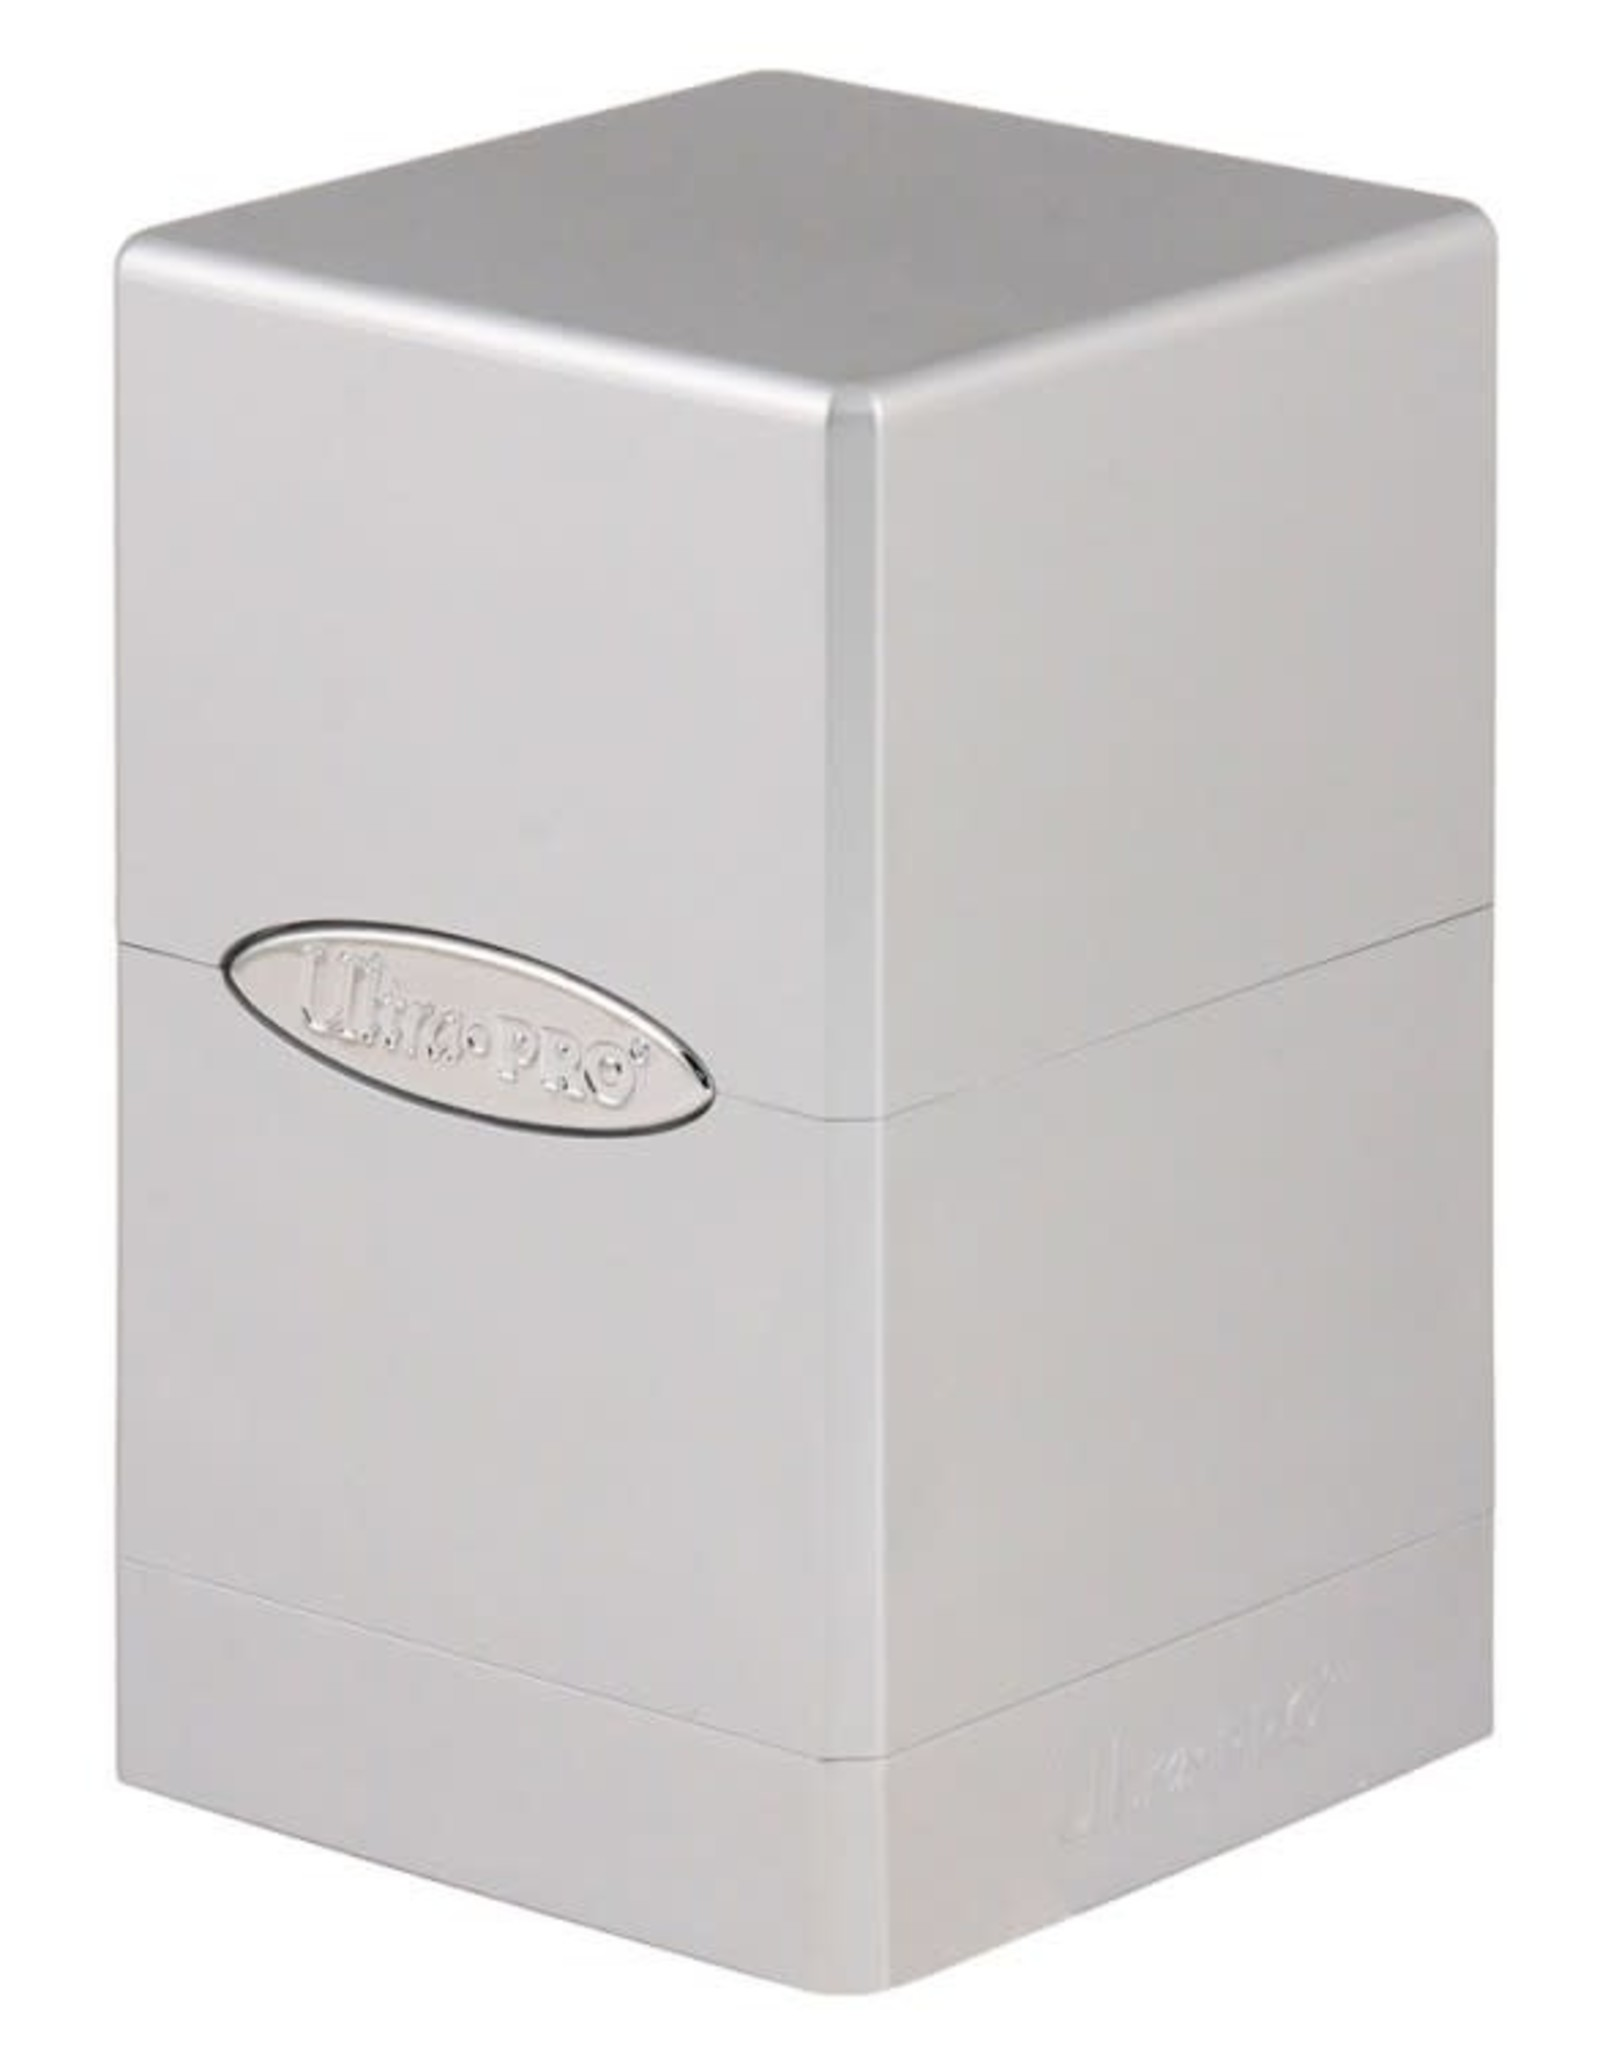 Ultra Pro Satin Tower Deck Box: Metallic Silver